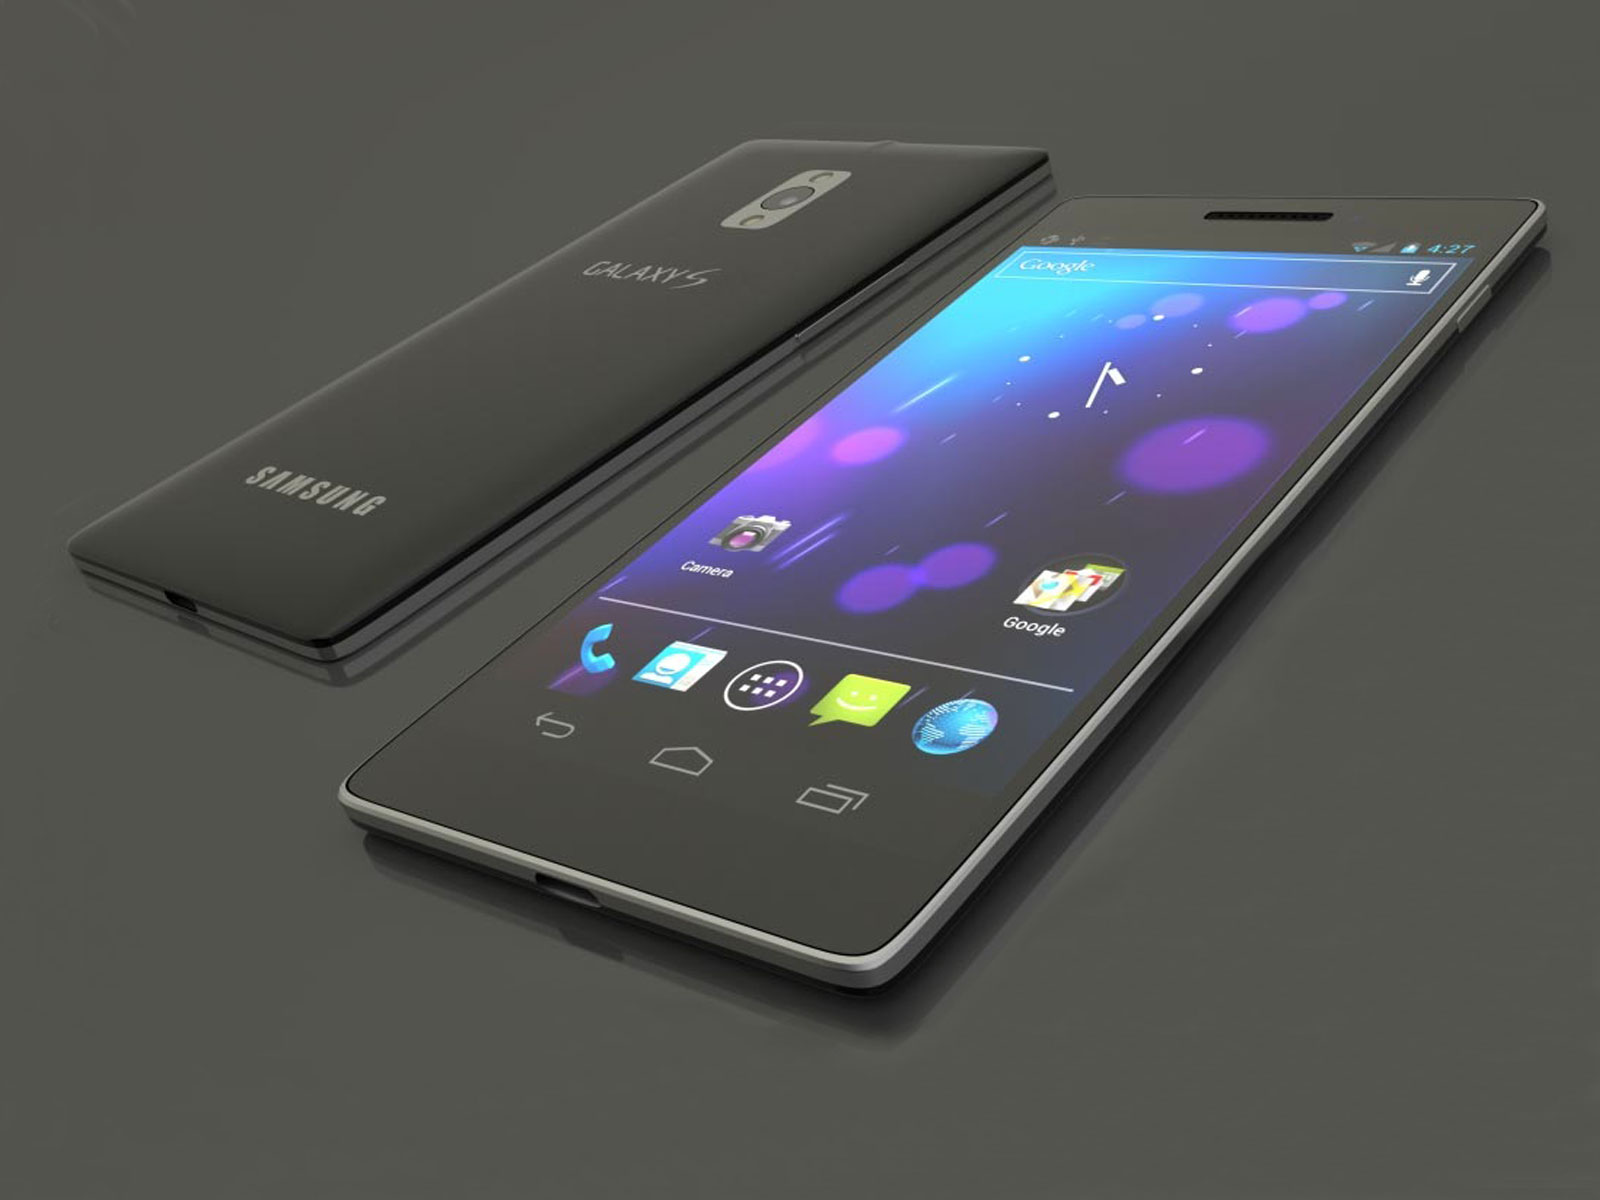 image0011 - Samsung Galaxy S5 ra mắt quý I/2014, bán kèm Galaxy Gear